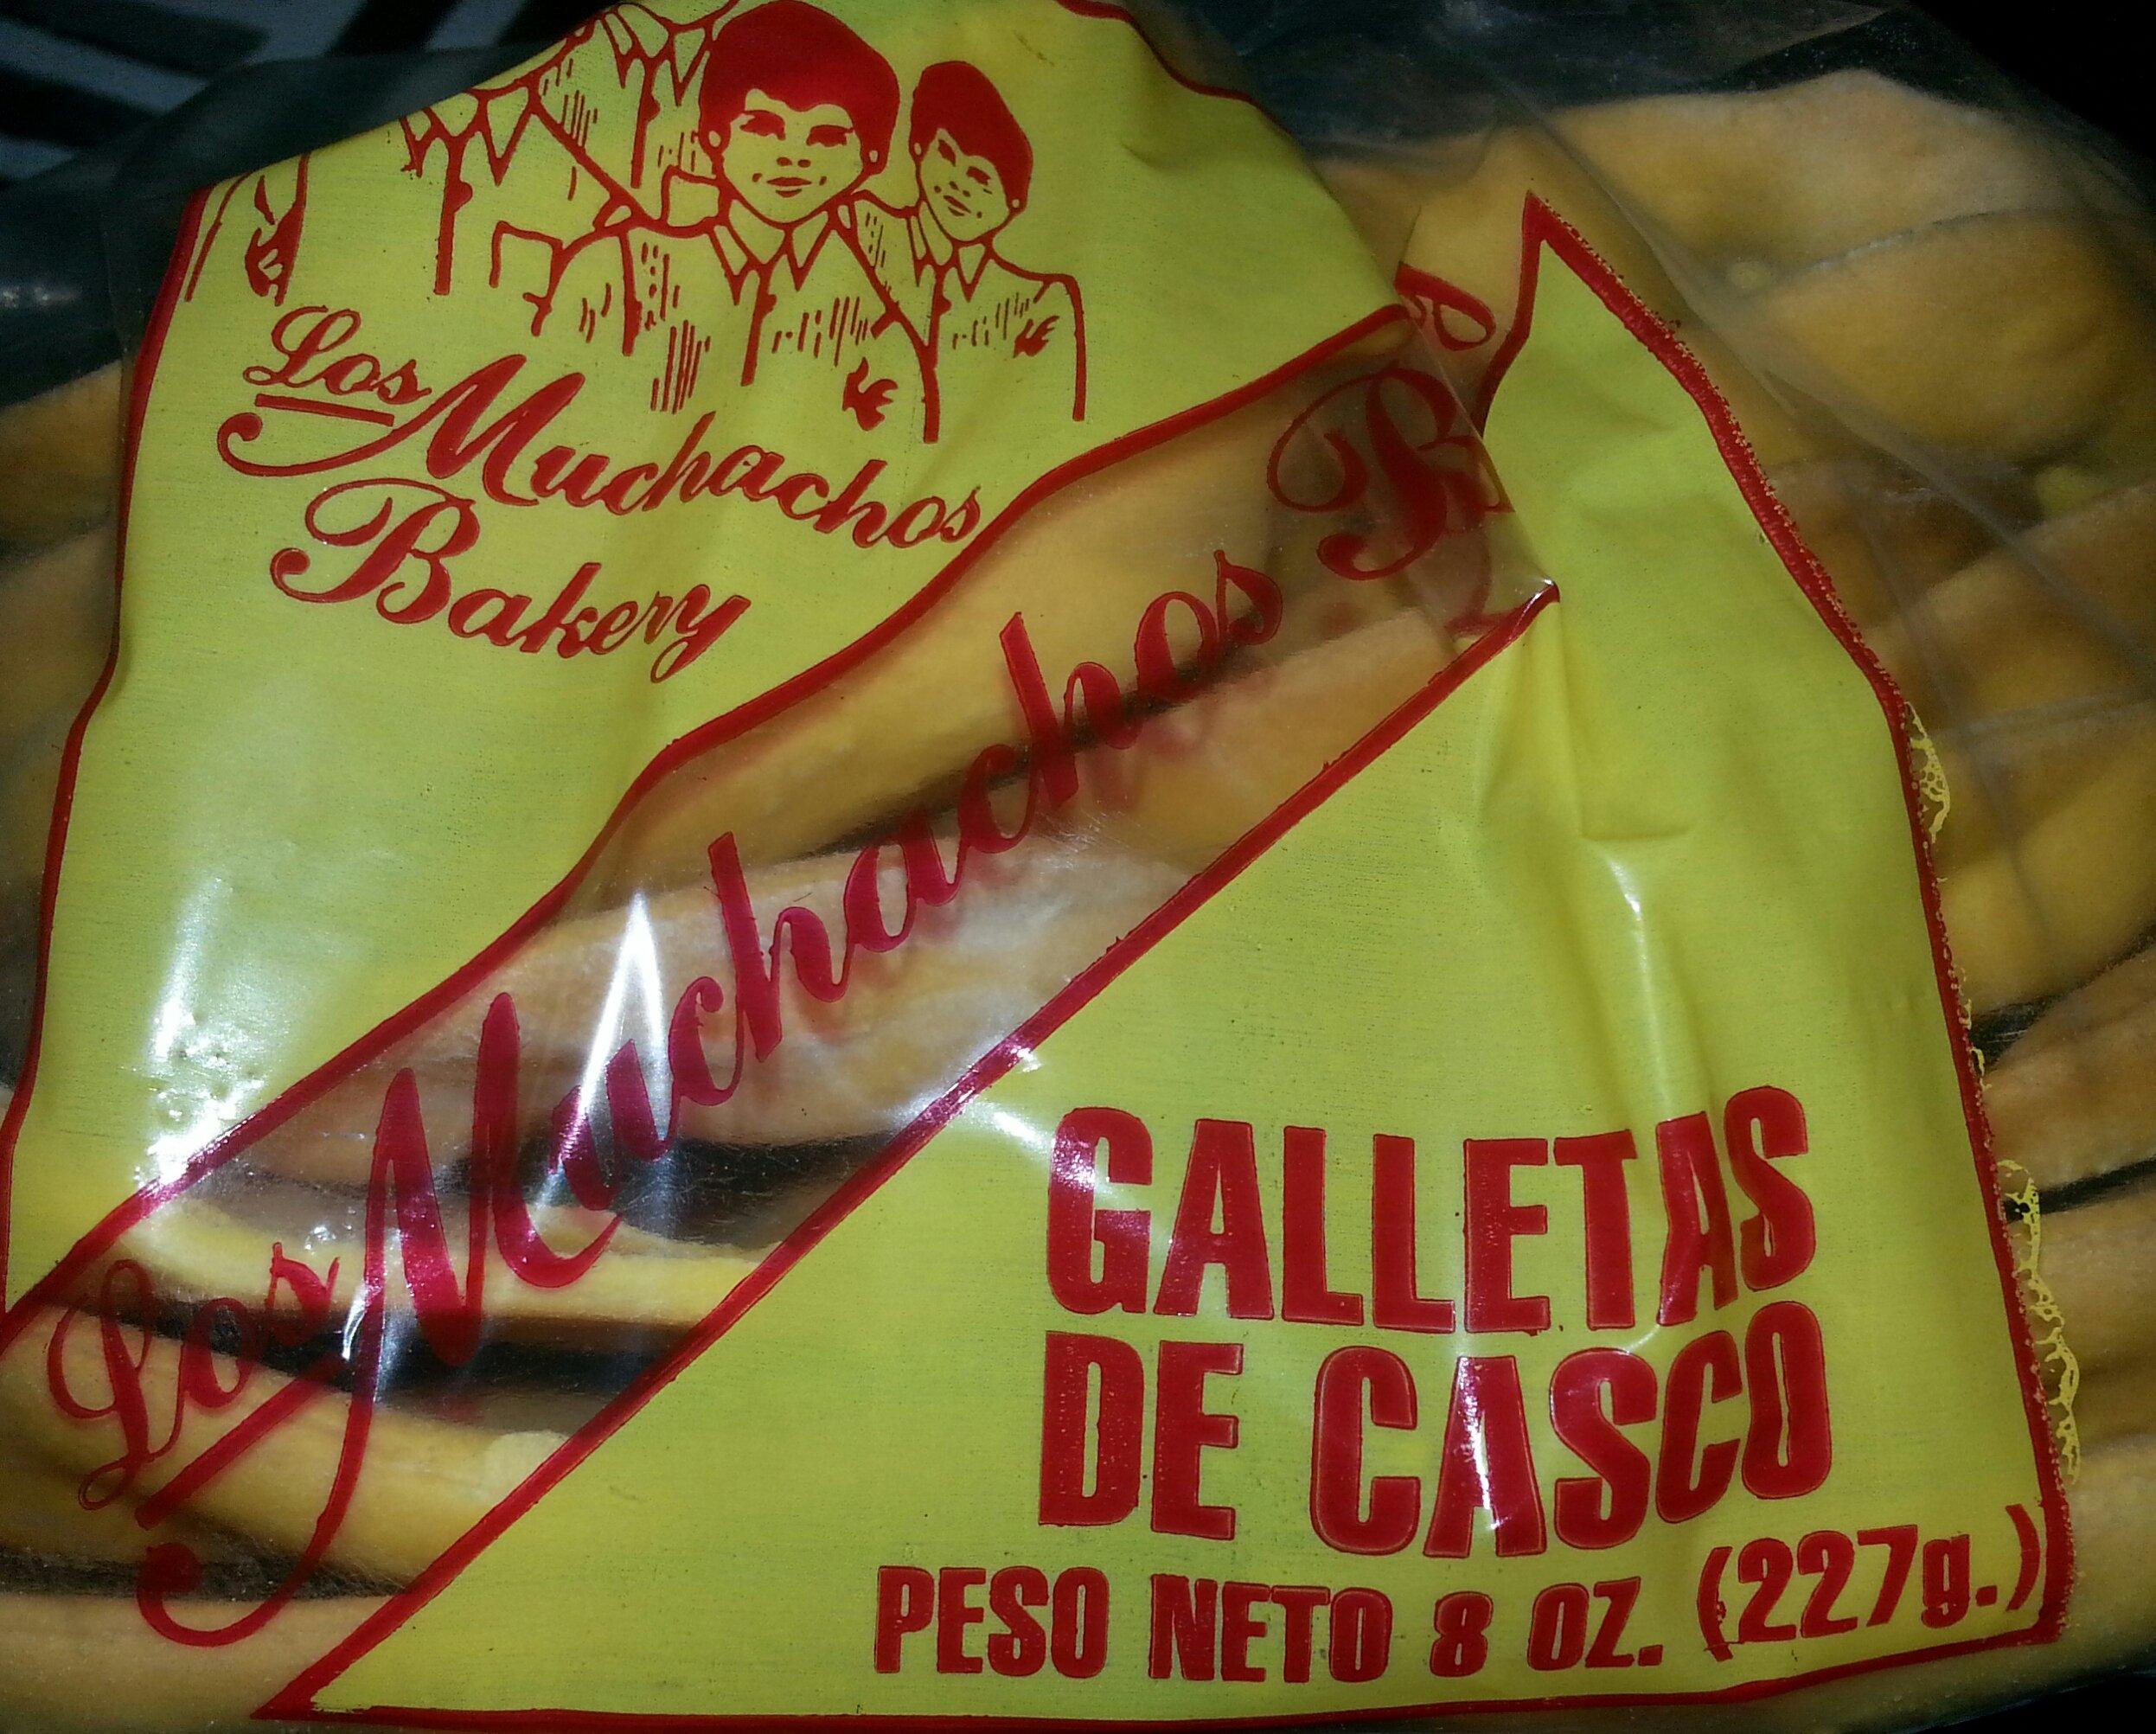 Cookies Helmet (Galletas De Casco) By Los Muchachos Bakery, 14-16 Cookies